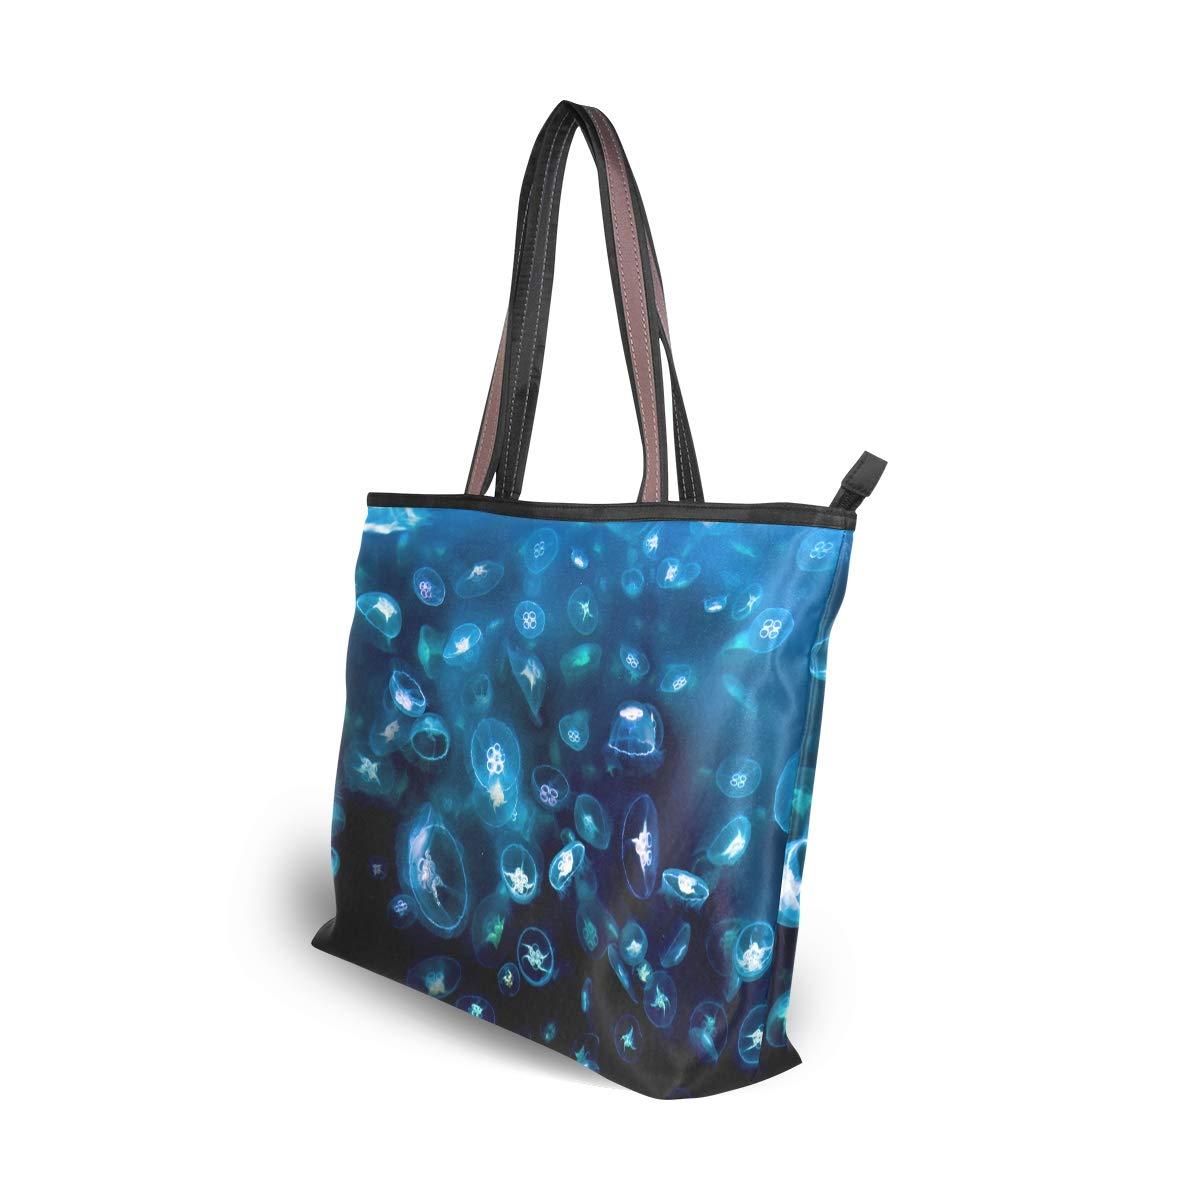 Women Moon Jellyfish Aurelia Large Tote Bag Shoulder Bag Lightweight For Gym Hiking Picnic Travel Beach Waterproof Handbag